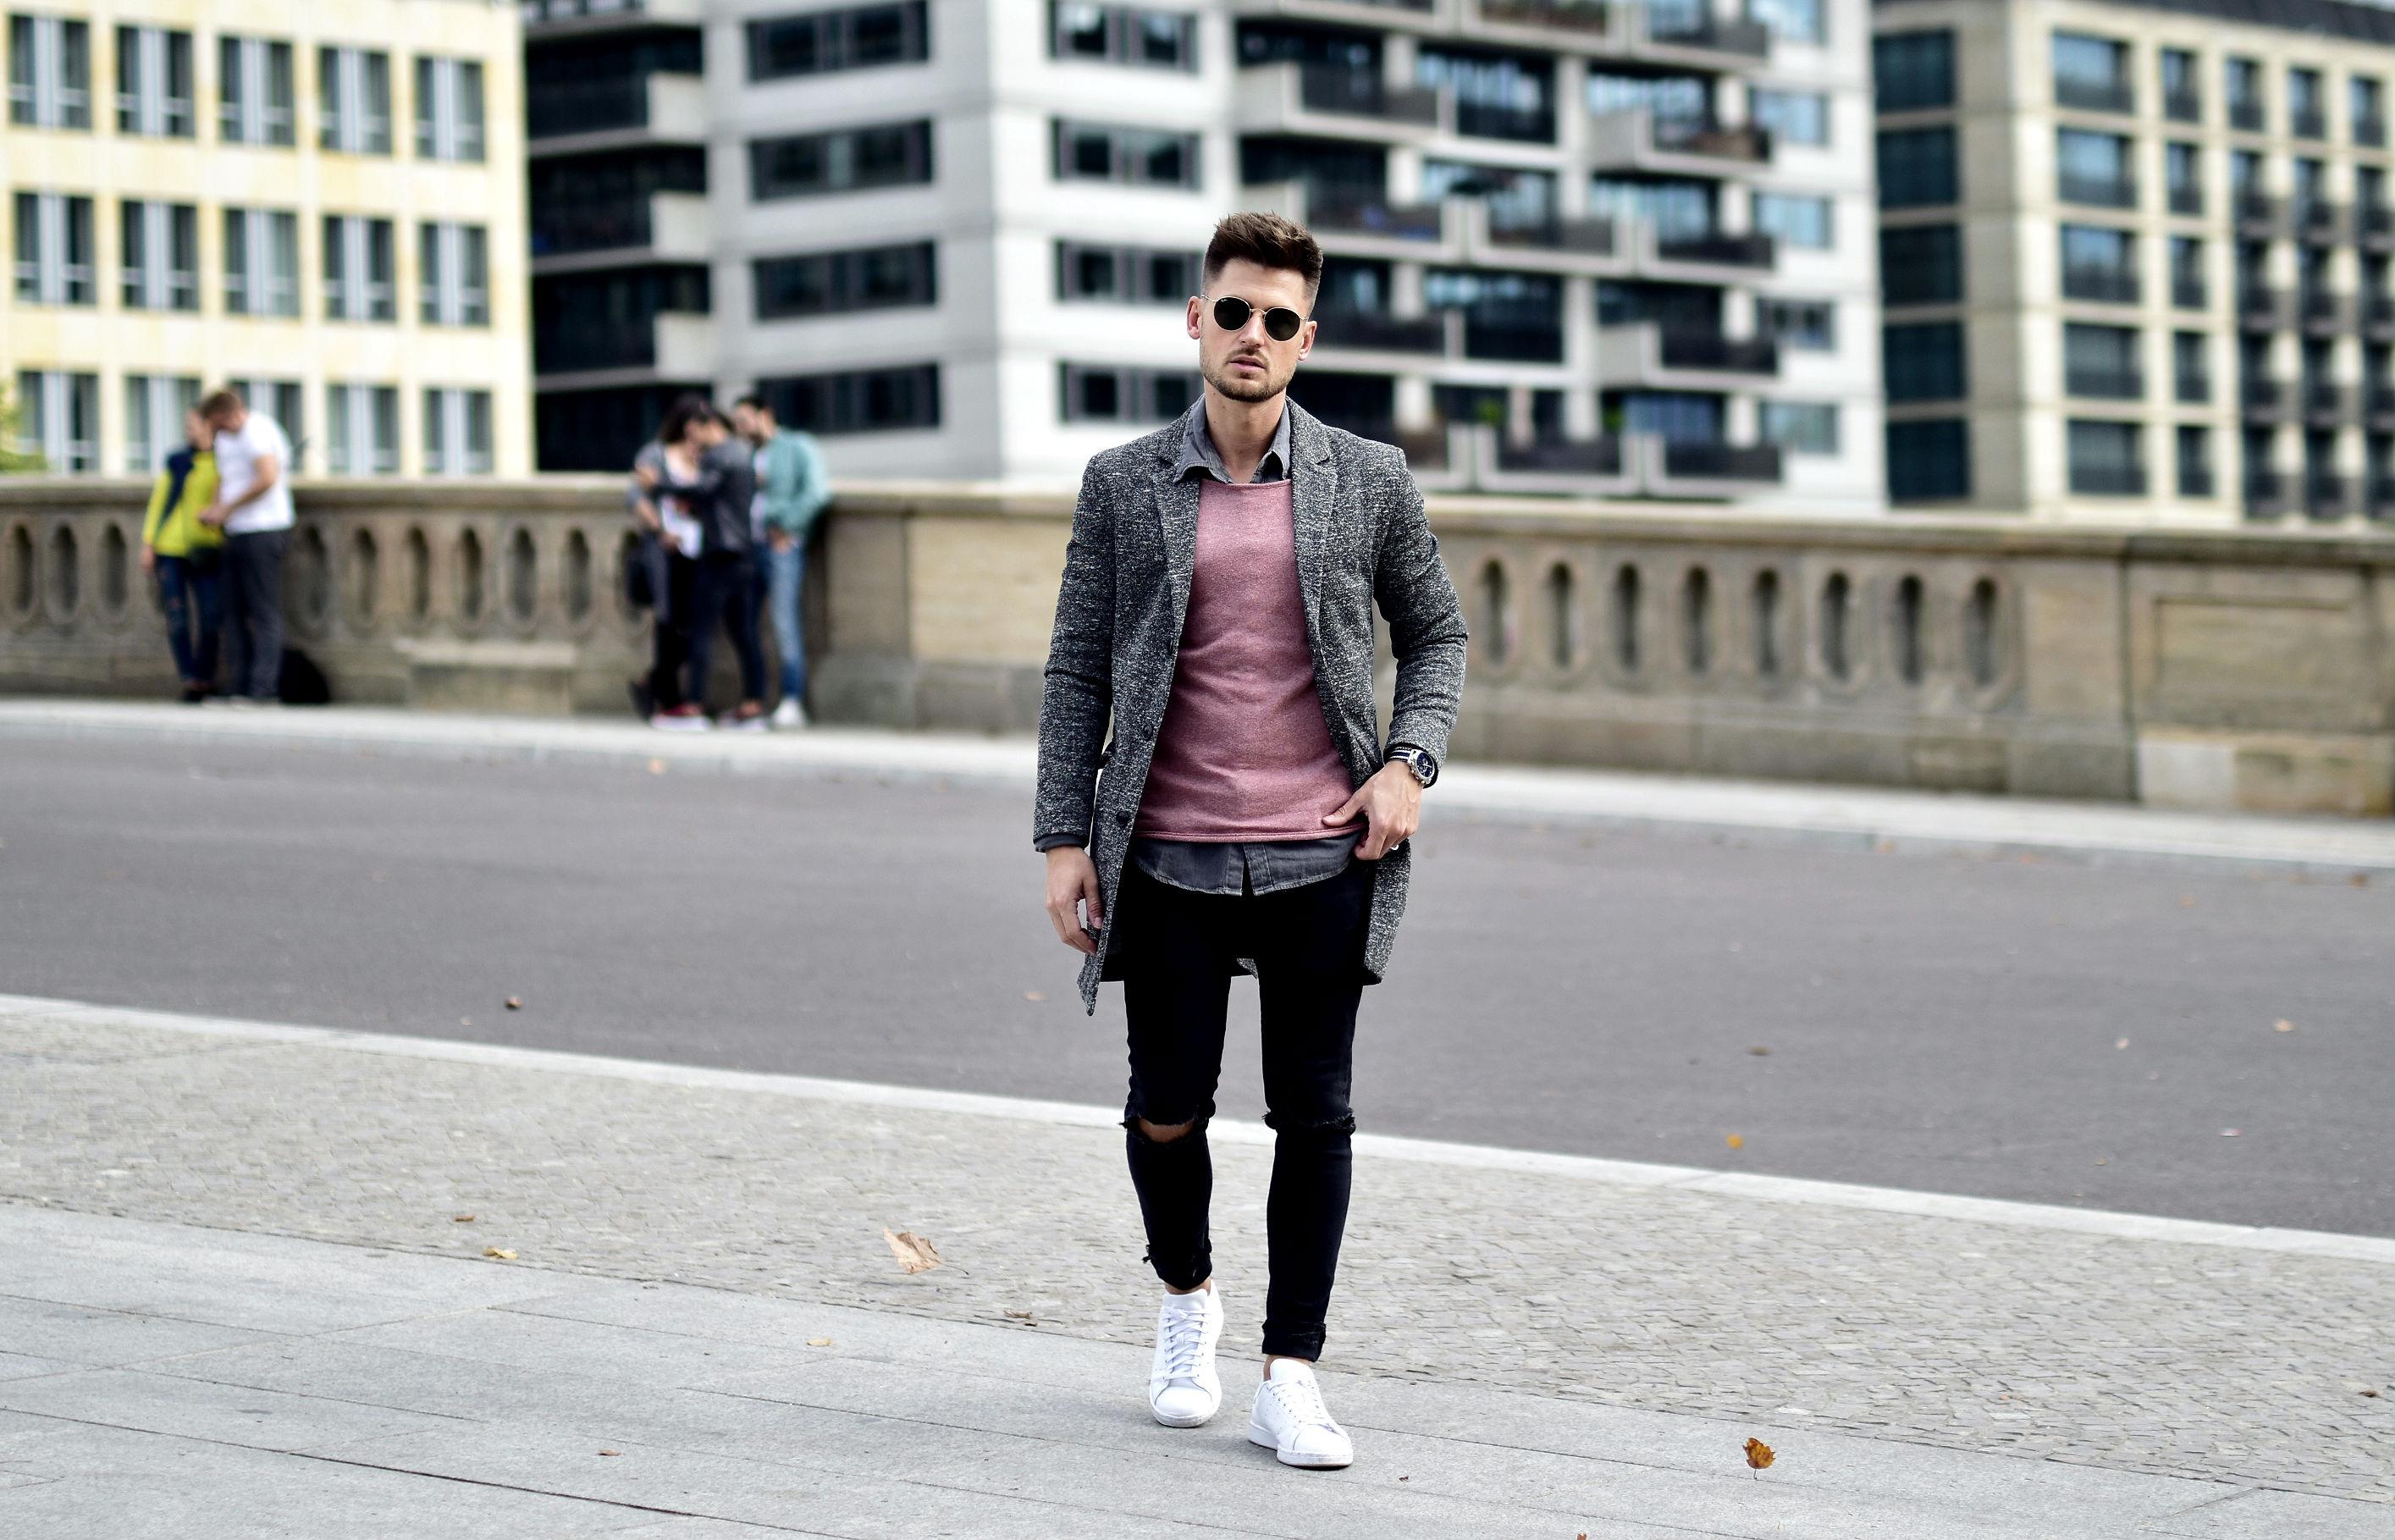 Tommeezjerry-Styleblog-Männerblog-Männer-Modeblog-Berlin-Berlinblog-Männermodeblog-Outfit-Long-Blazer-Mantel-Adidas-Stan-Smith-Streetstyle-Casual-Ripped-Jeans